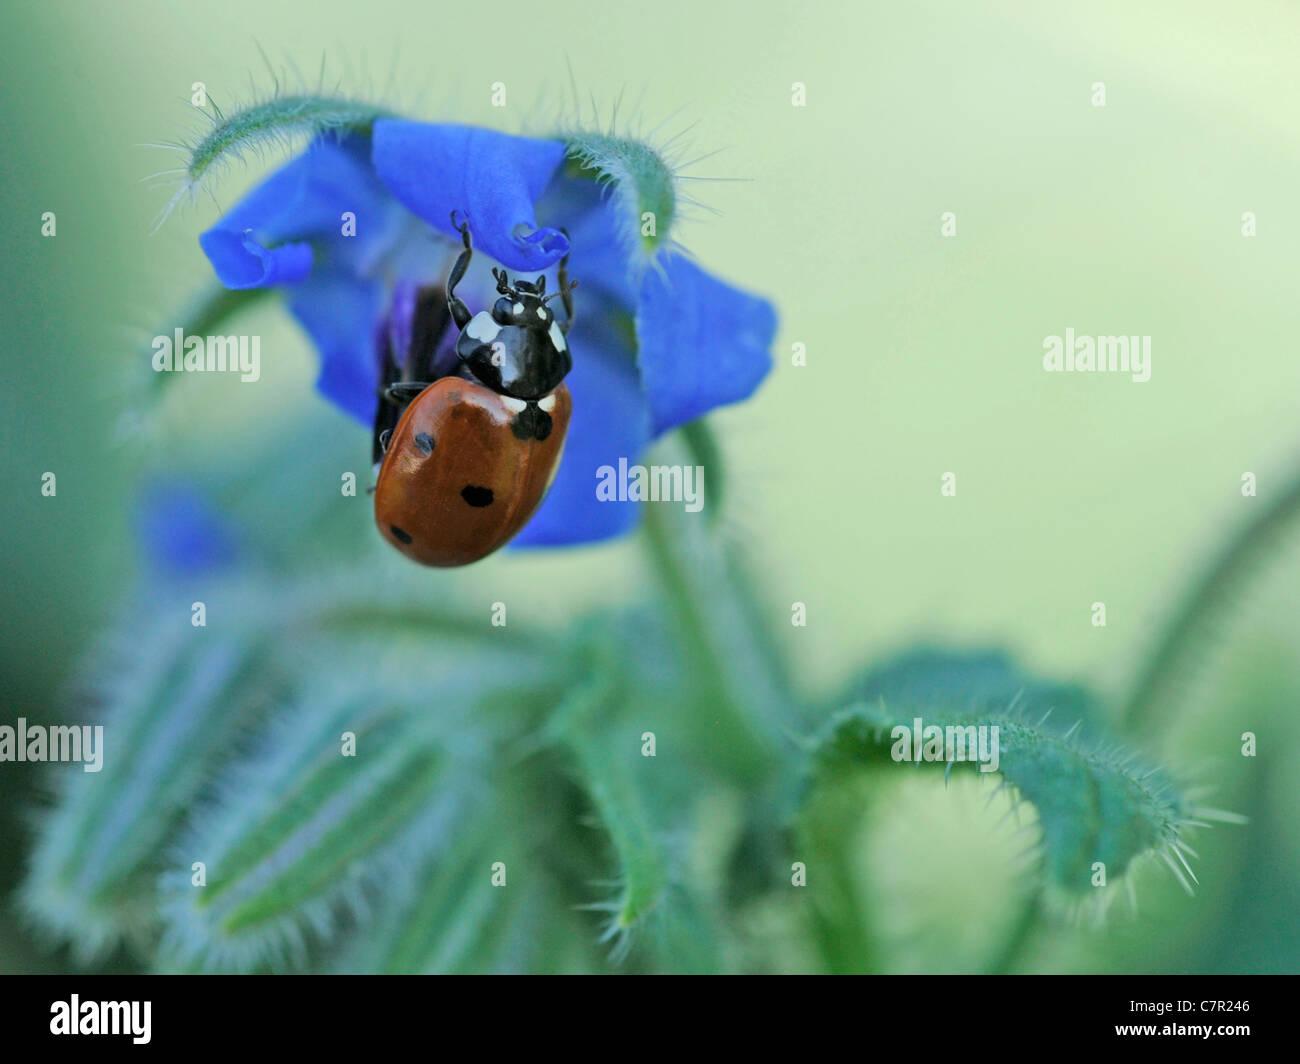 A  ladybird on a borage flower, by a borage leaf - Stock Image